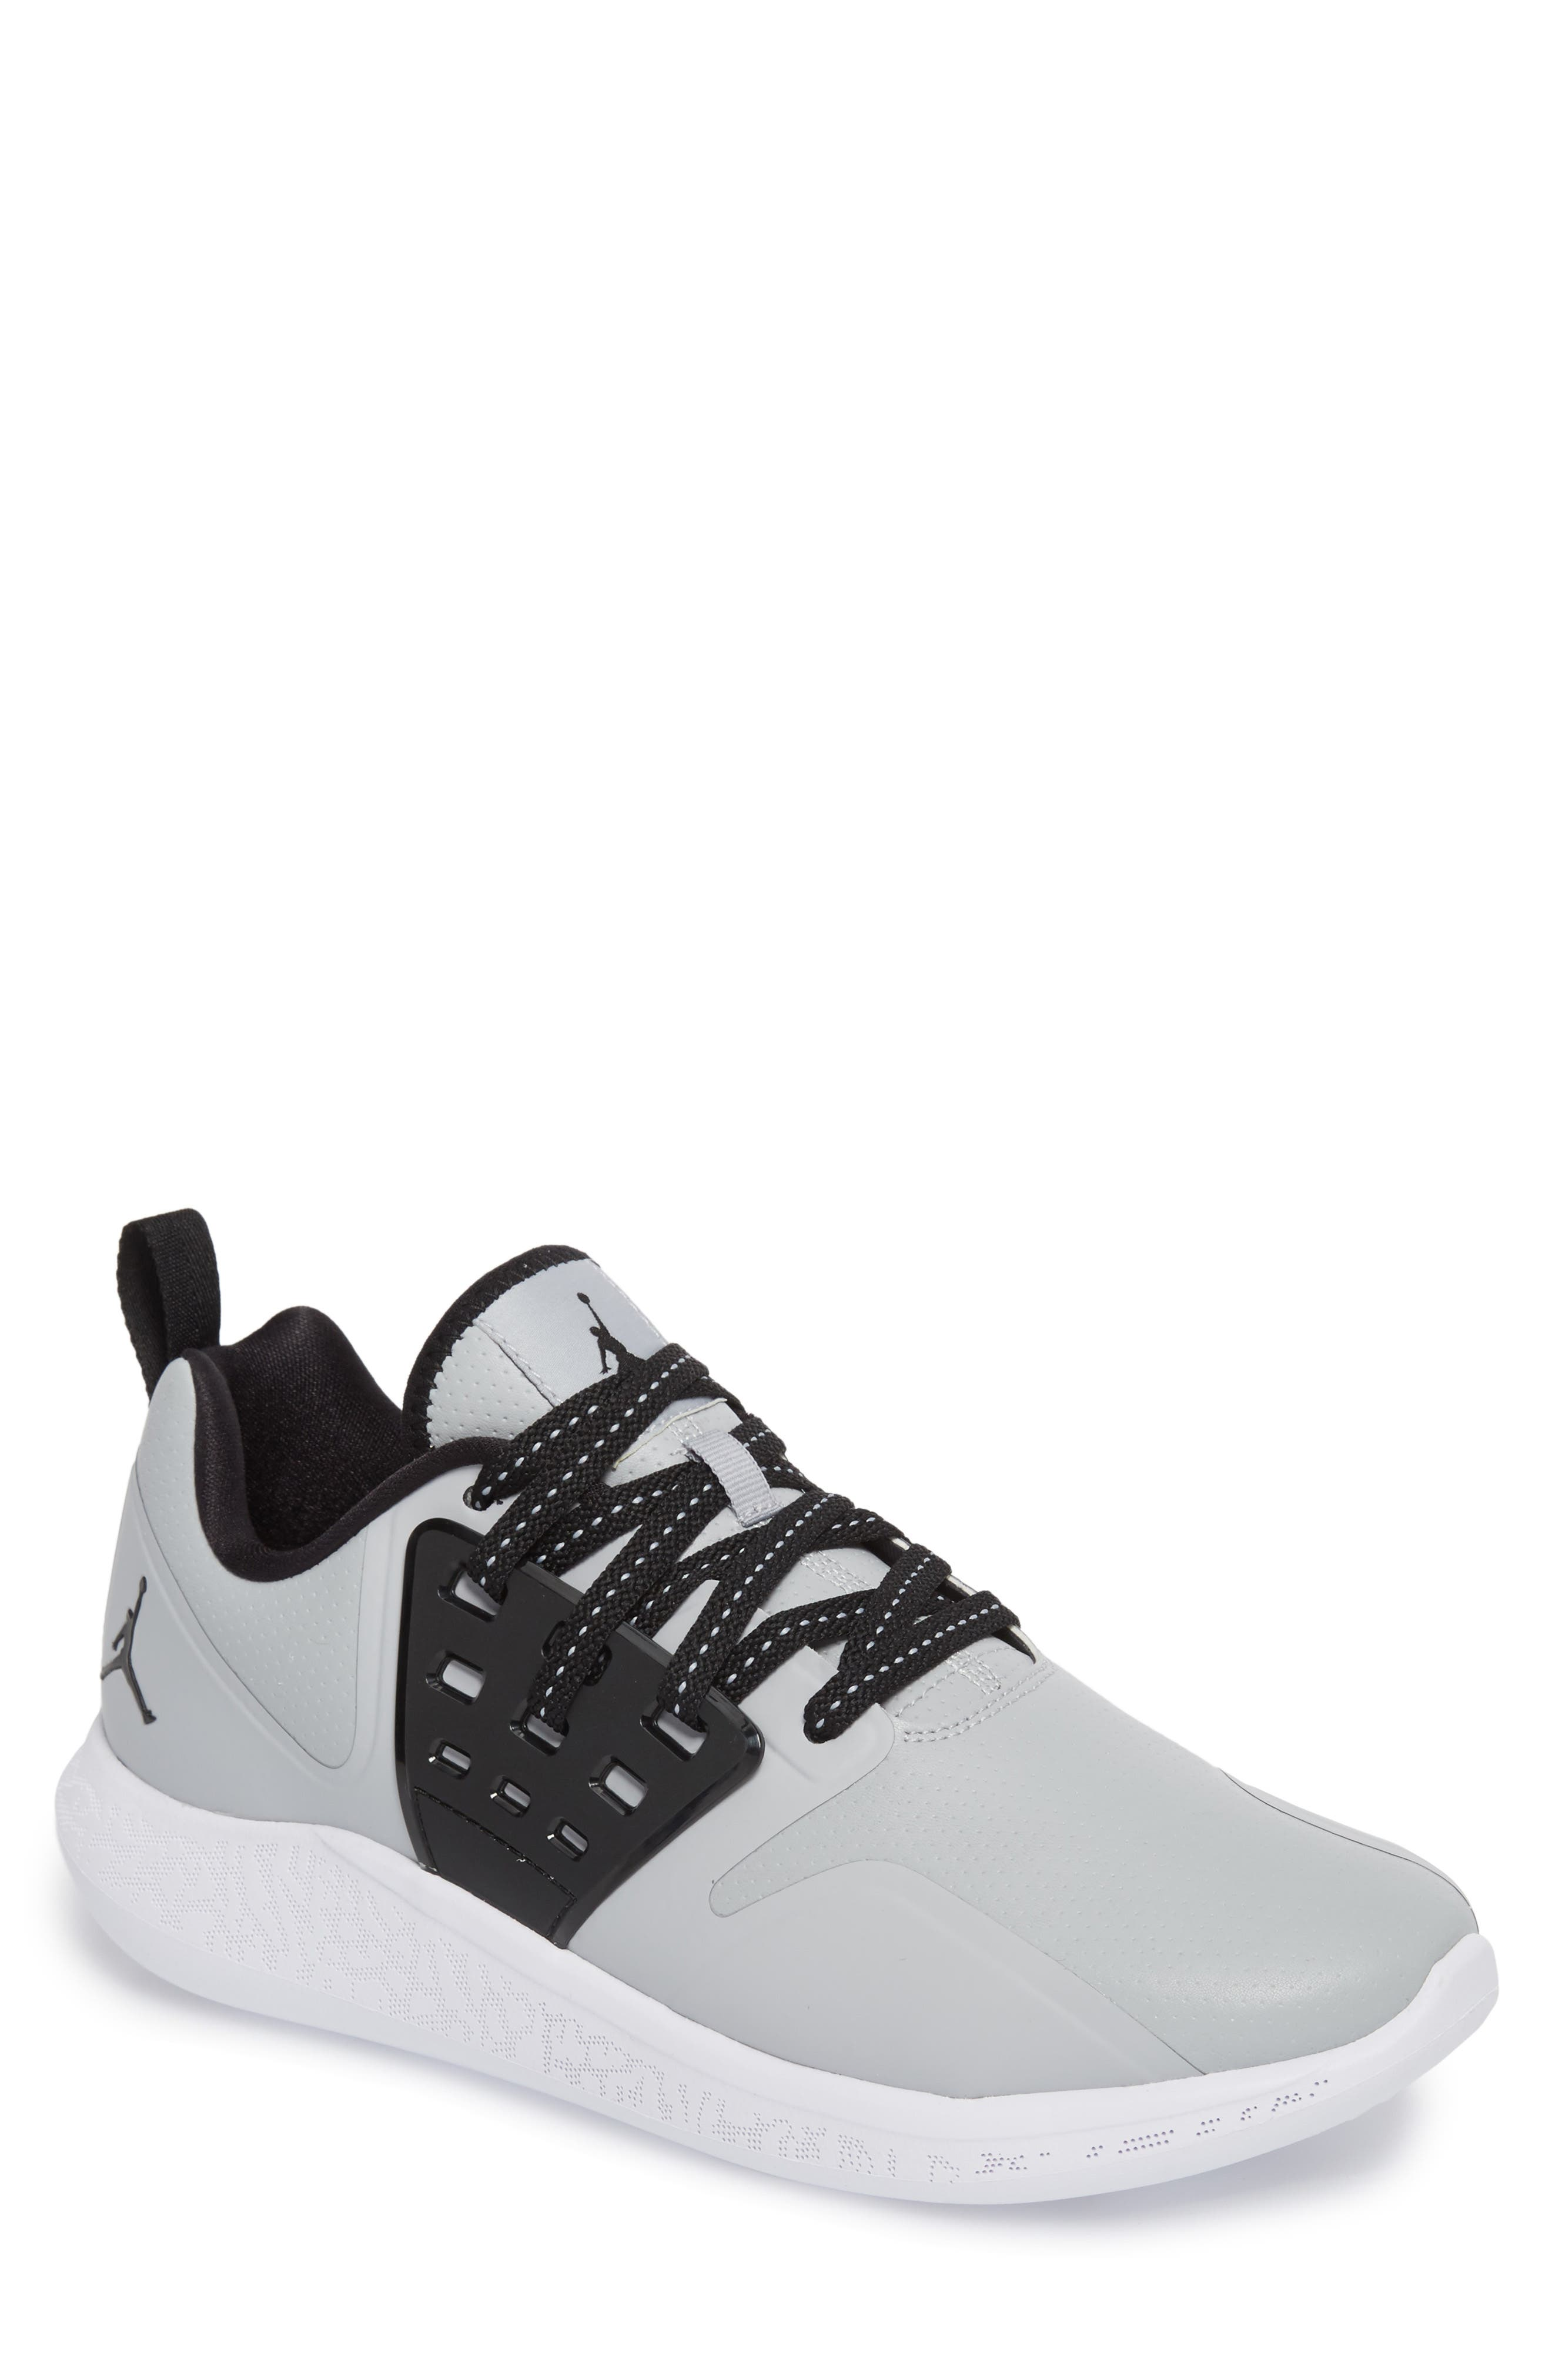 Jordan Grind Running Shoe,                         Main,                         color, Wolf Grey/ Black/ White